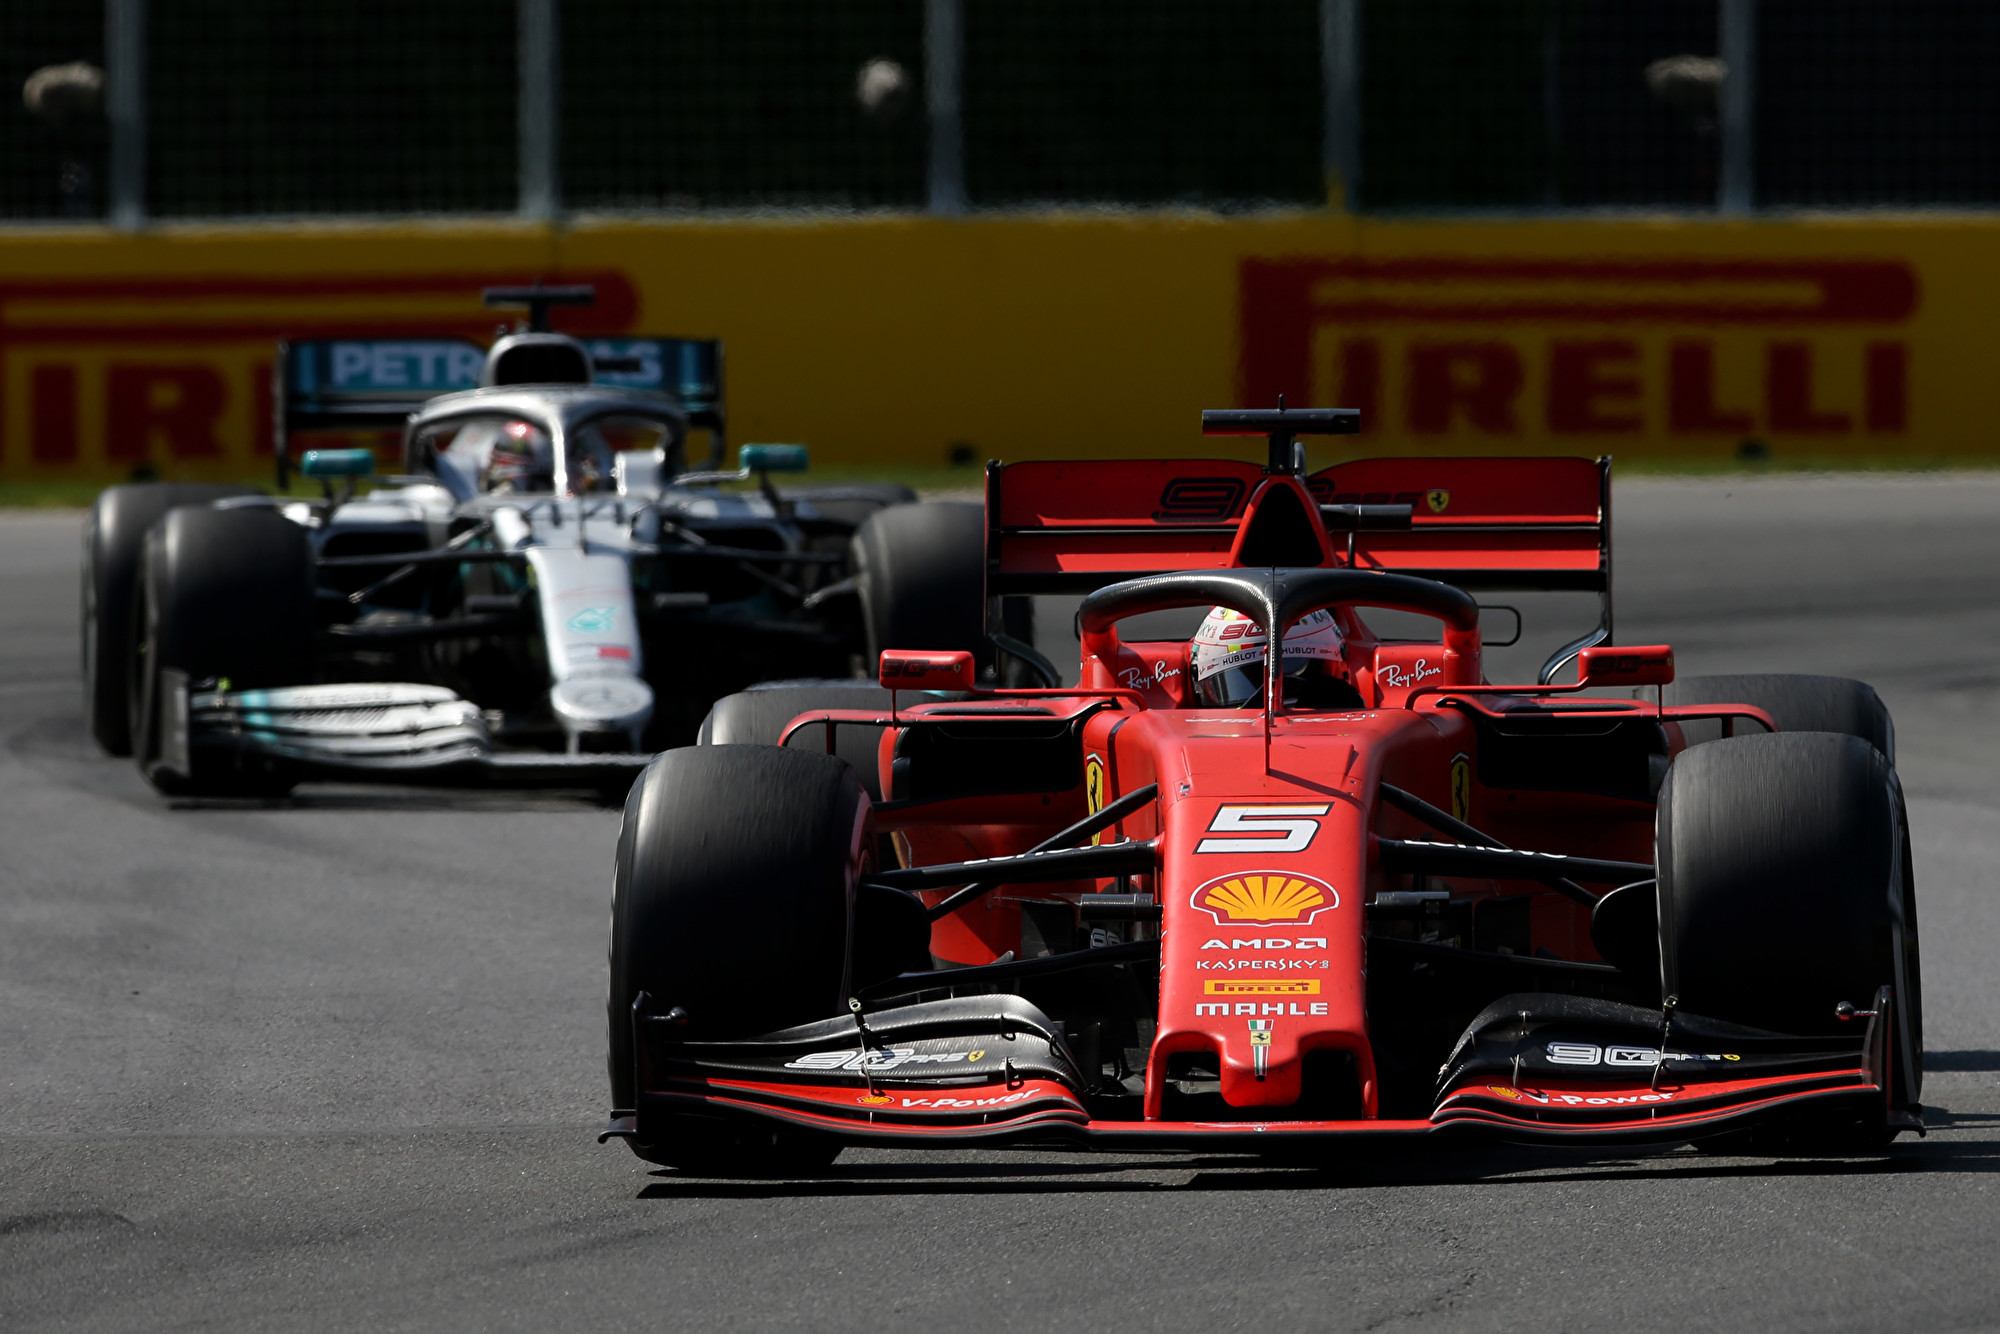 F1加拿大站 维特尔遭罚 汉密尔顿顺势登顶